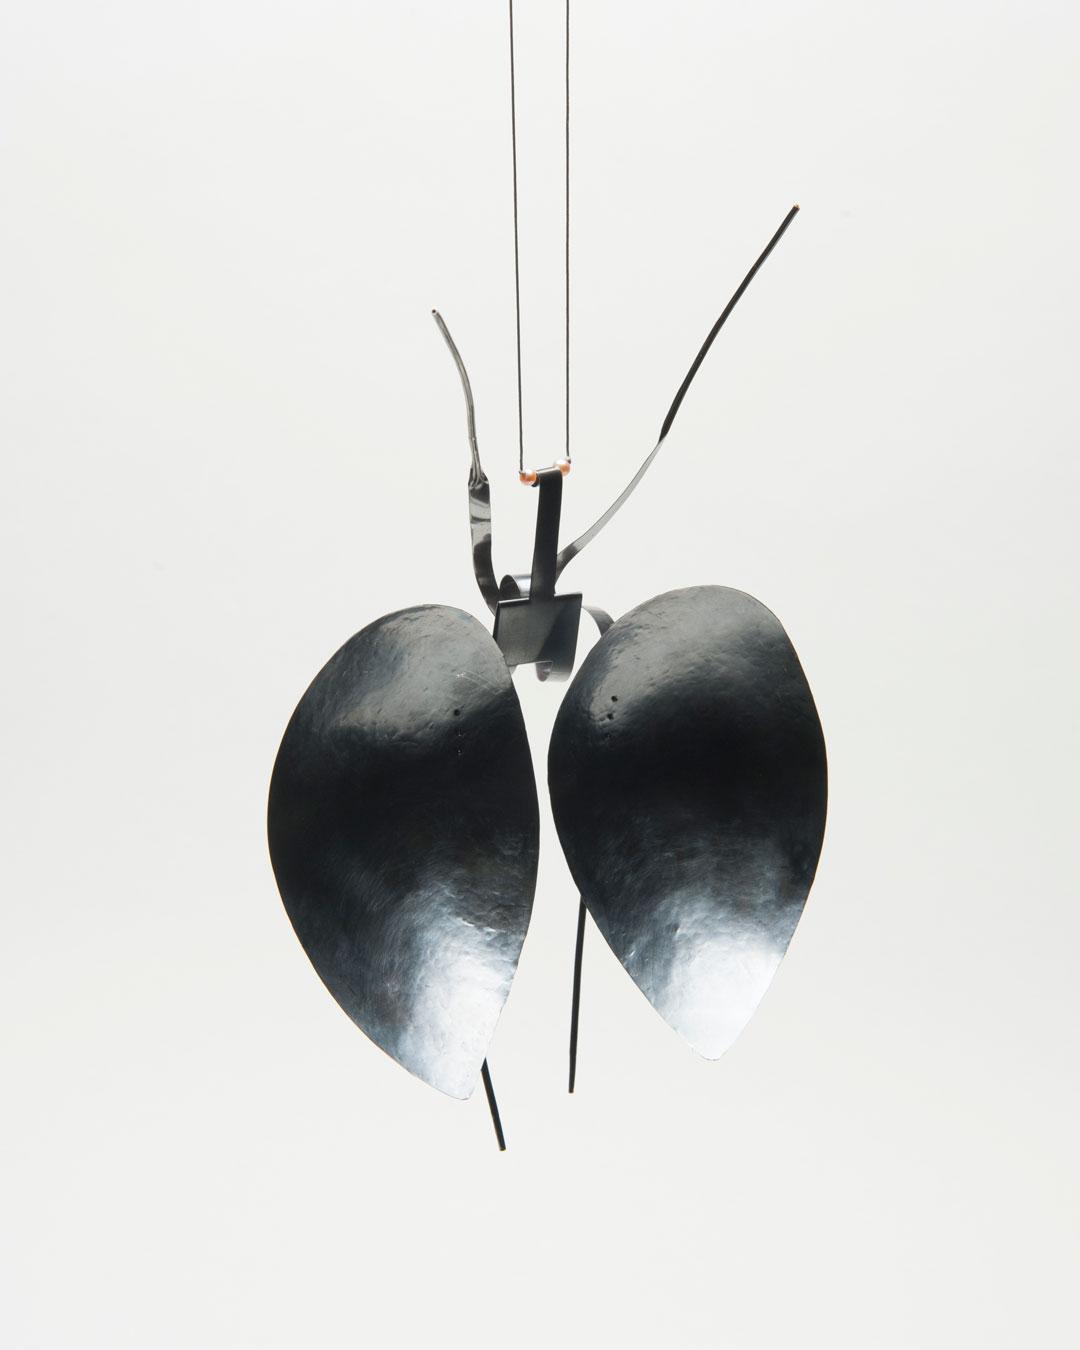 Andrea Wippermann, Mantis Religiosa, 2018, pendant; blackened silver, stainless steel, beads, nylon, 240 x 160 x 50 mm, €3400